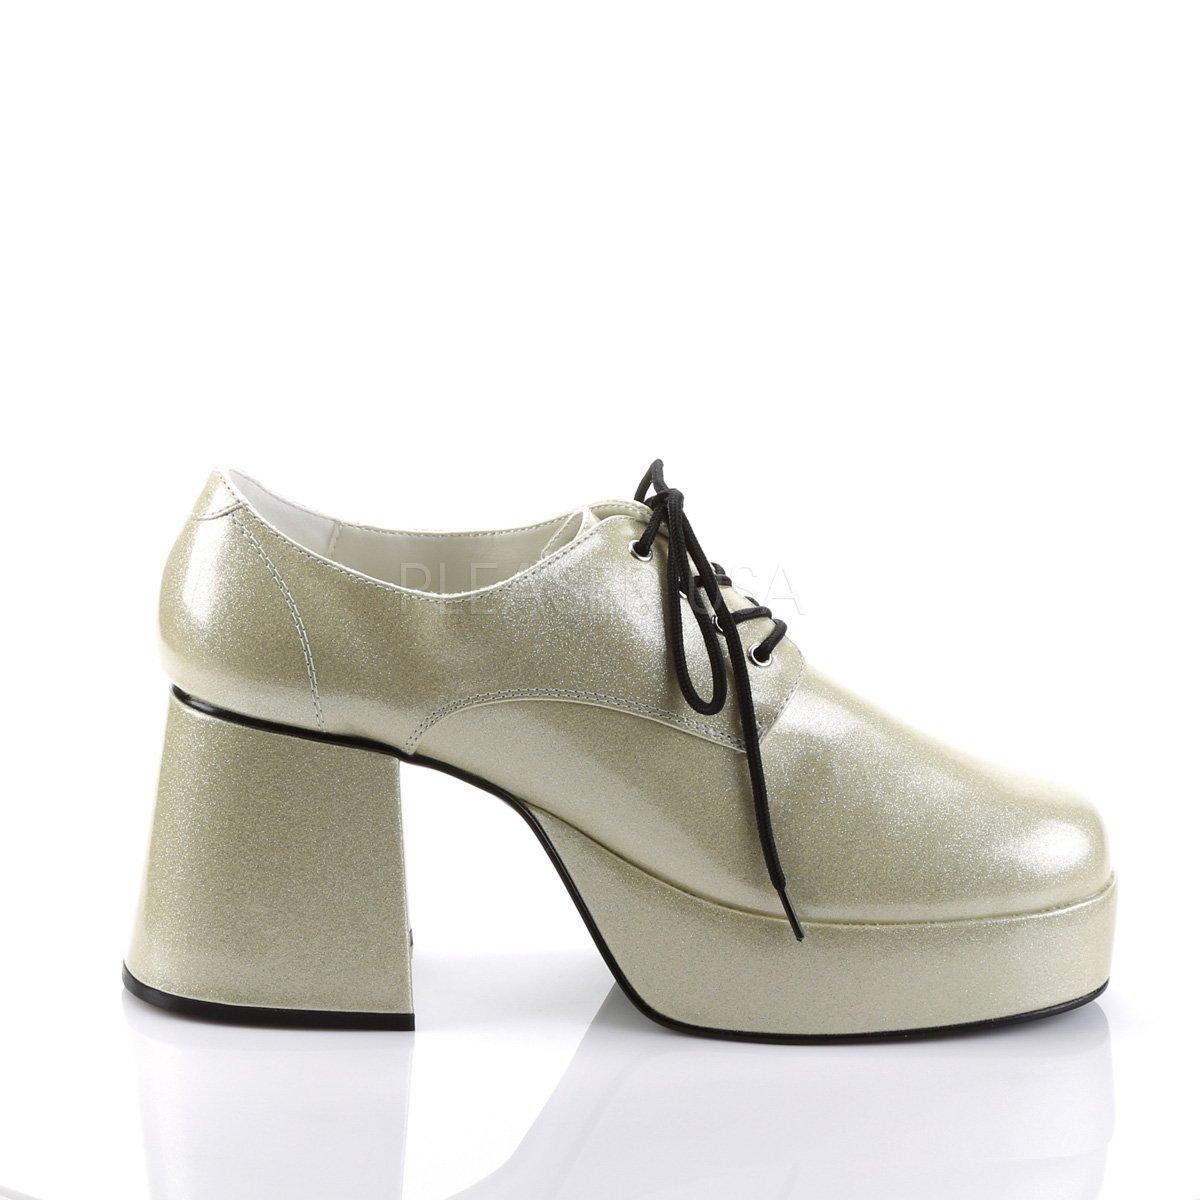 Higher-Heels Funtasma 70s 70s 70s Herren Disko Glitzer Plateauschuhe Jazz-02G Glitter B00B88SLAY Tanzschuhe Viele Stile e147c4